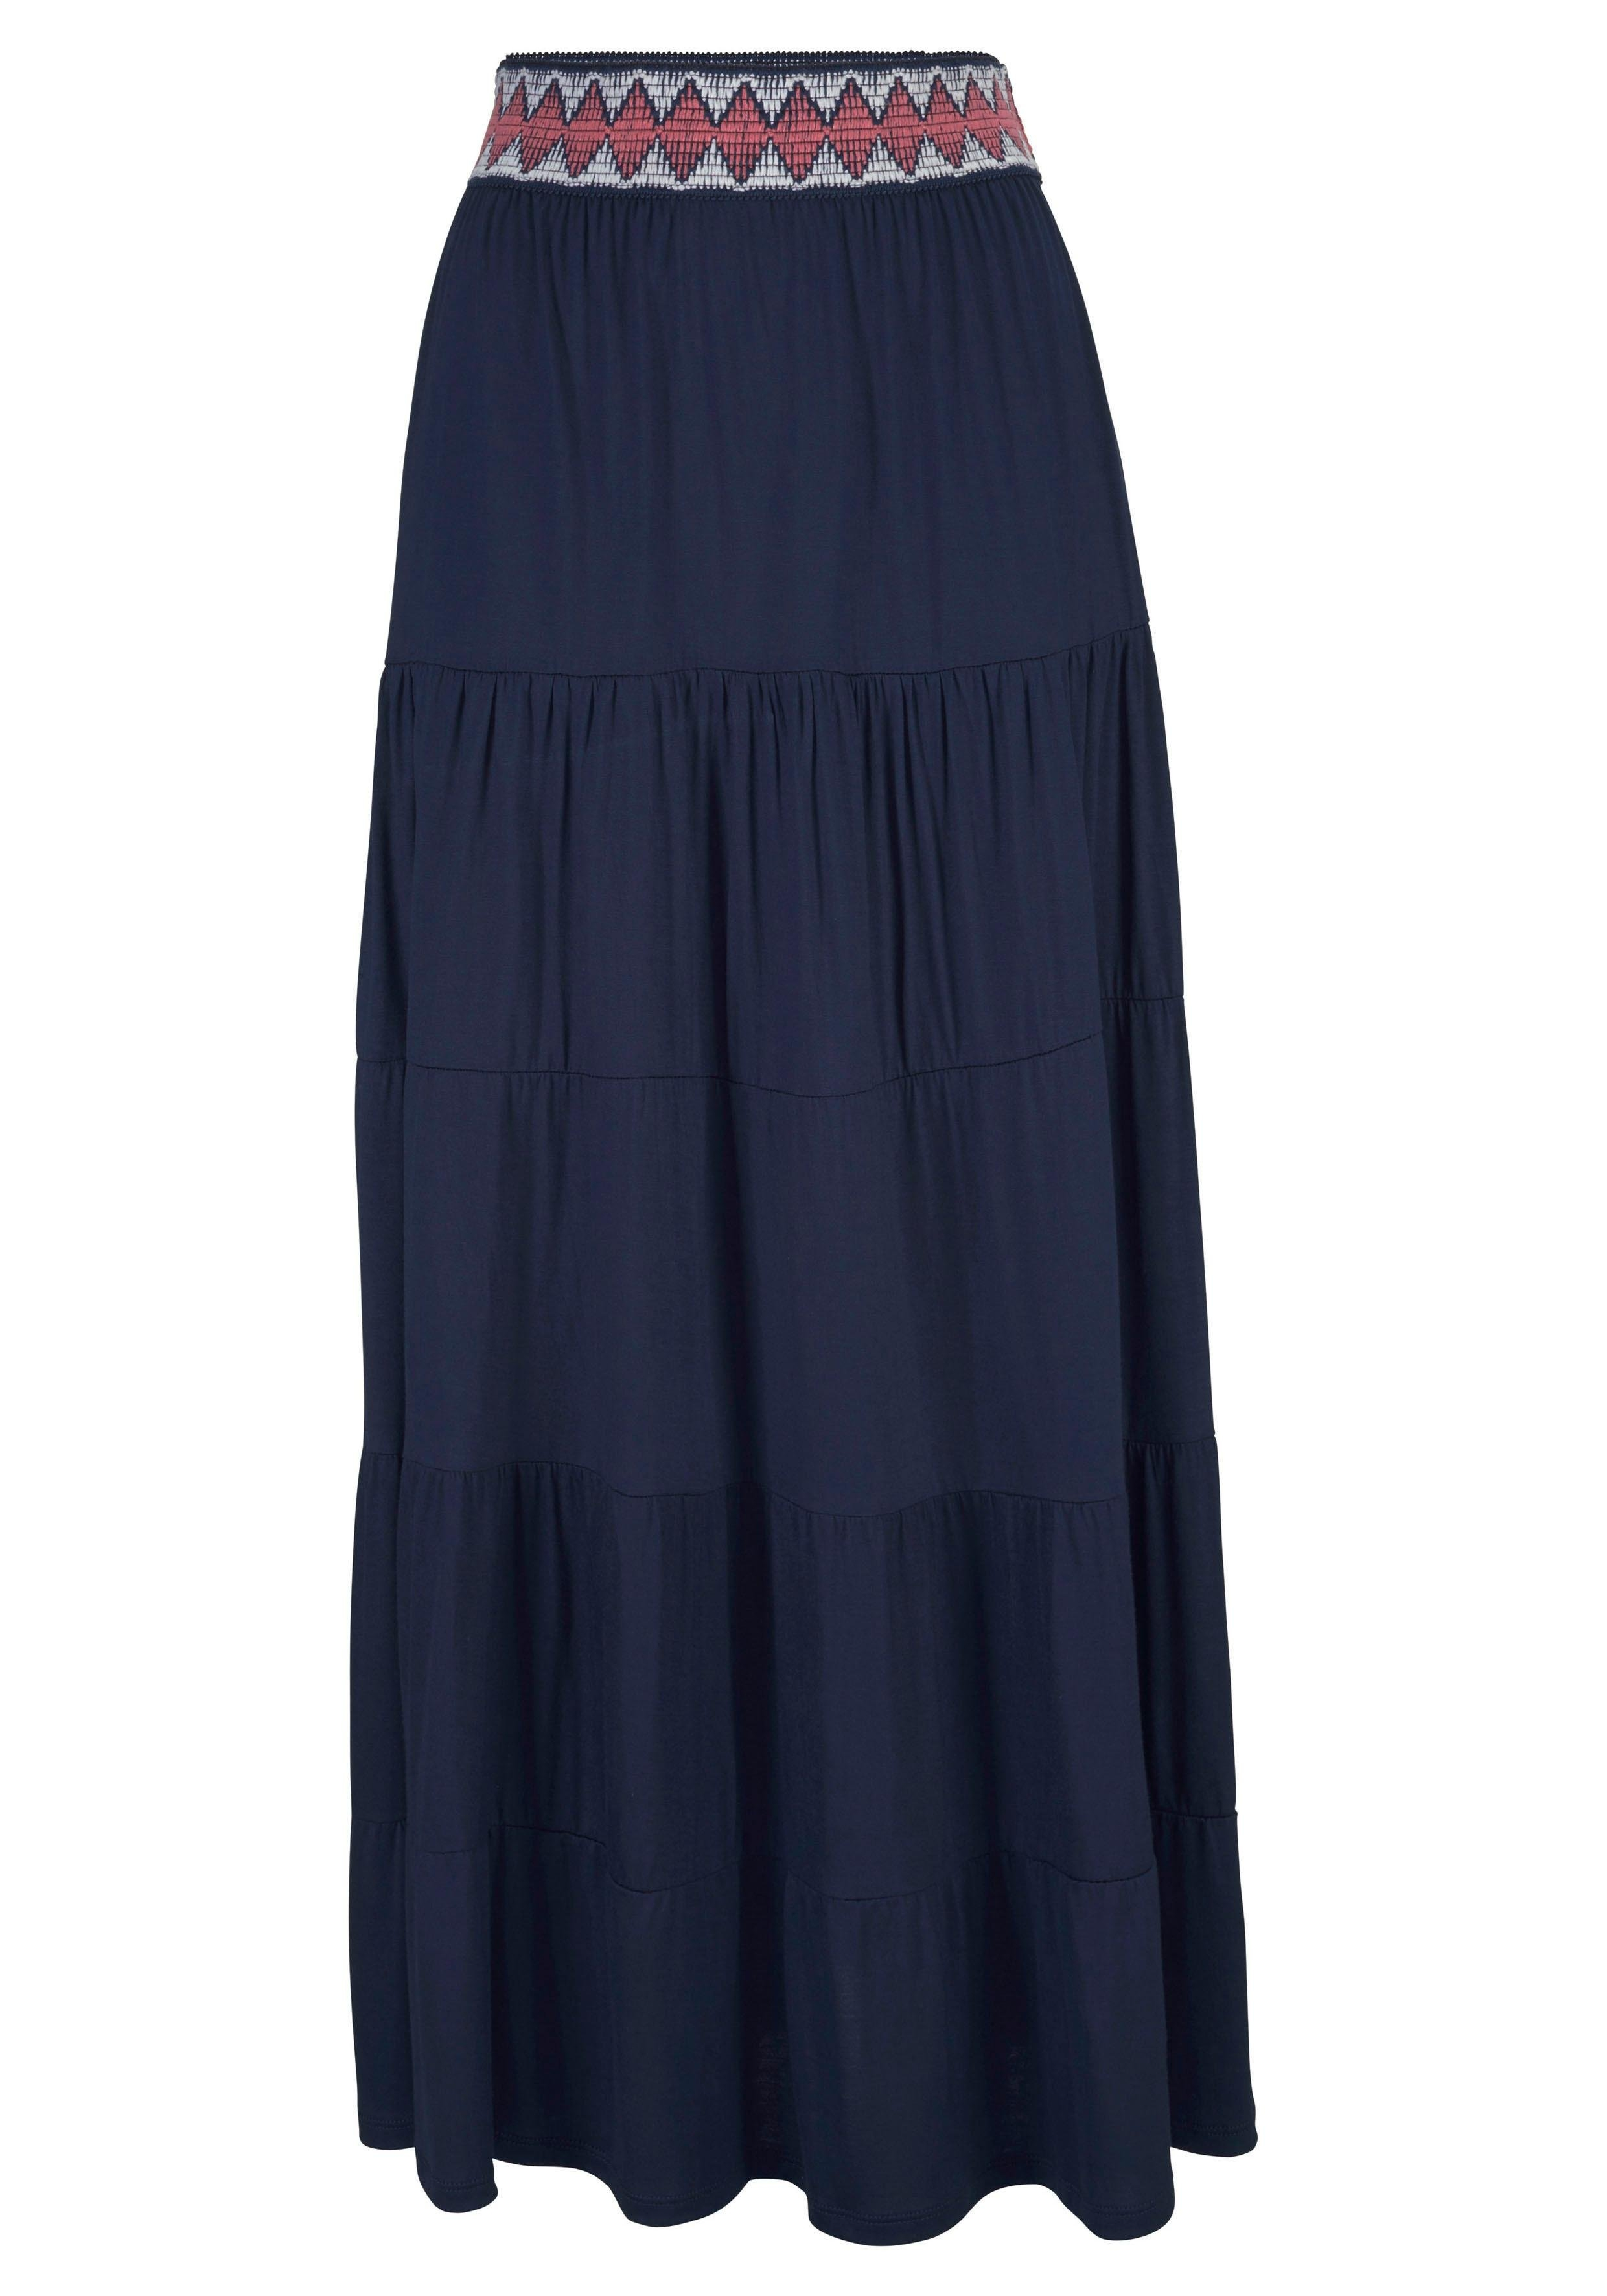 s.Oliver RED LABEL Beachwear Strandrok bij Lascana online kopen